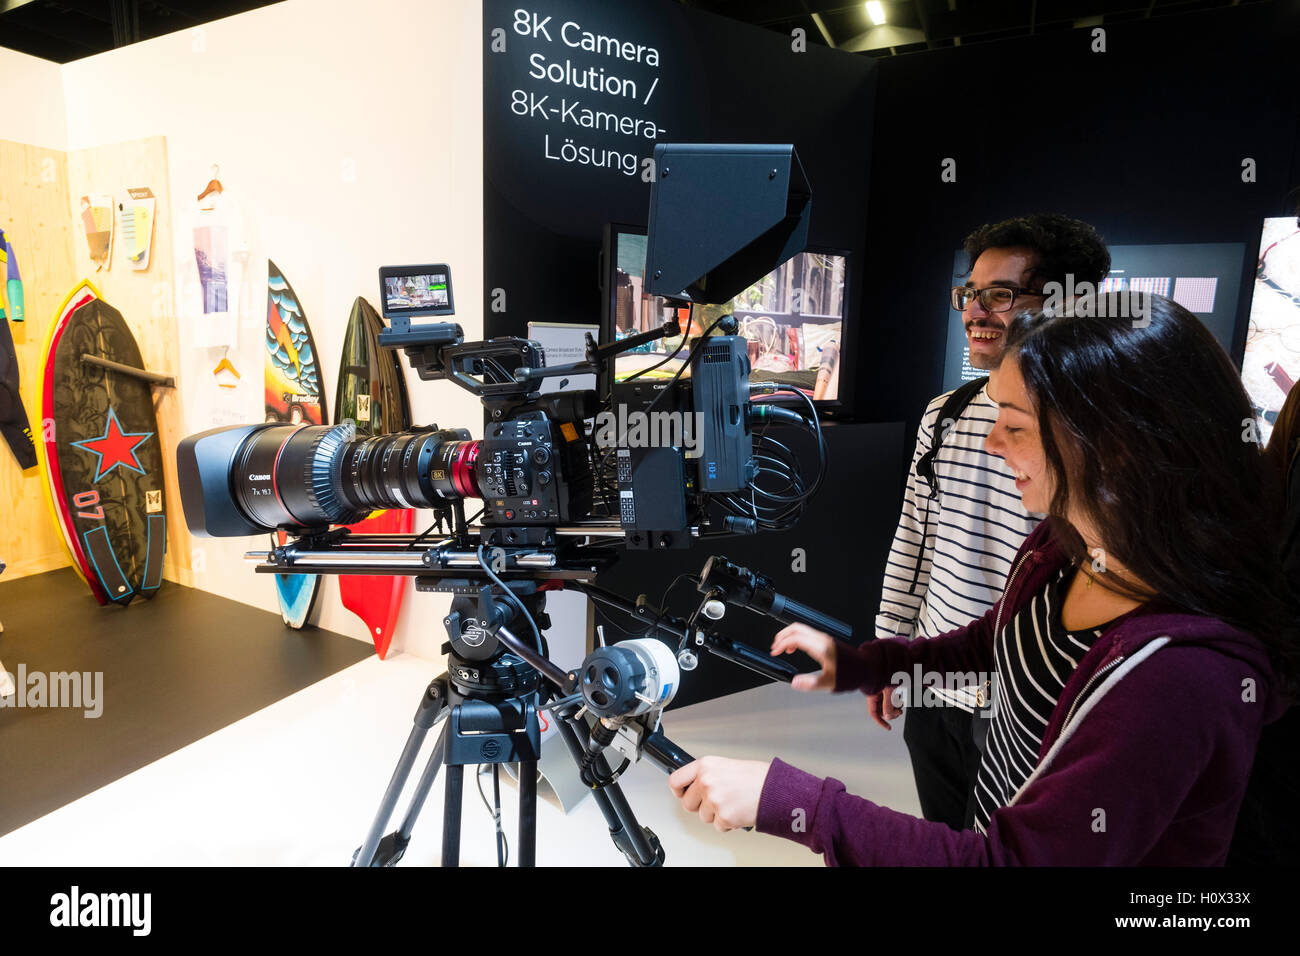 Canon 8k video prototype movie camera at Photokina trade fair in Cologne, Germany , 2016 - Stock Image